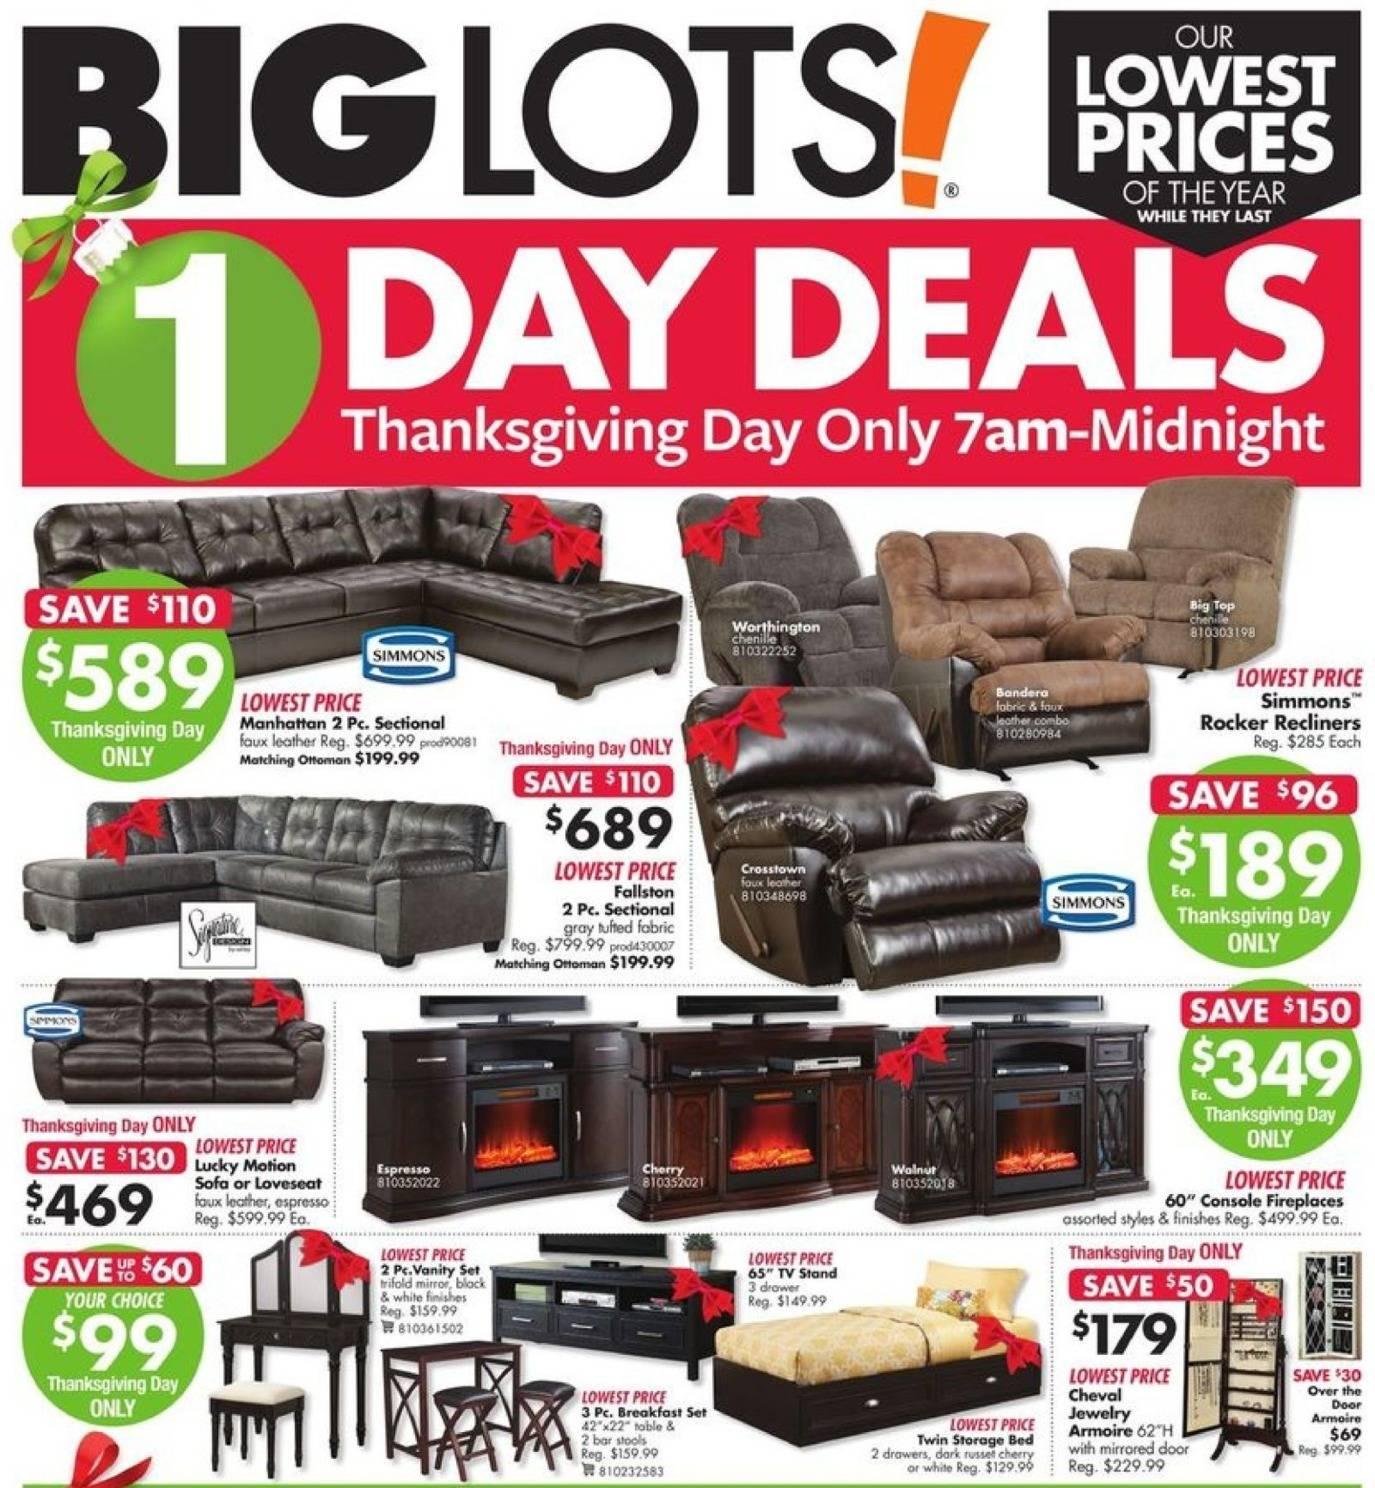 Big Lots 2017 Black Friday Ad Page 1